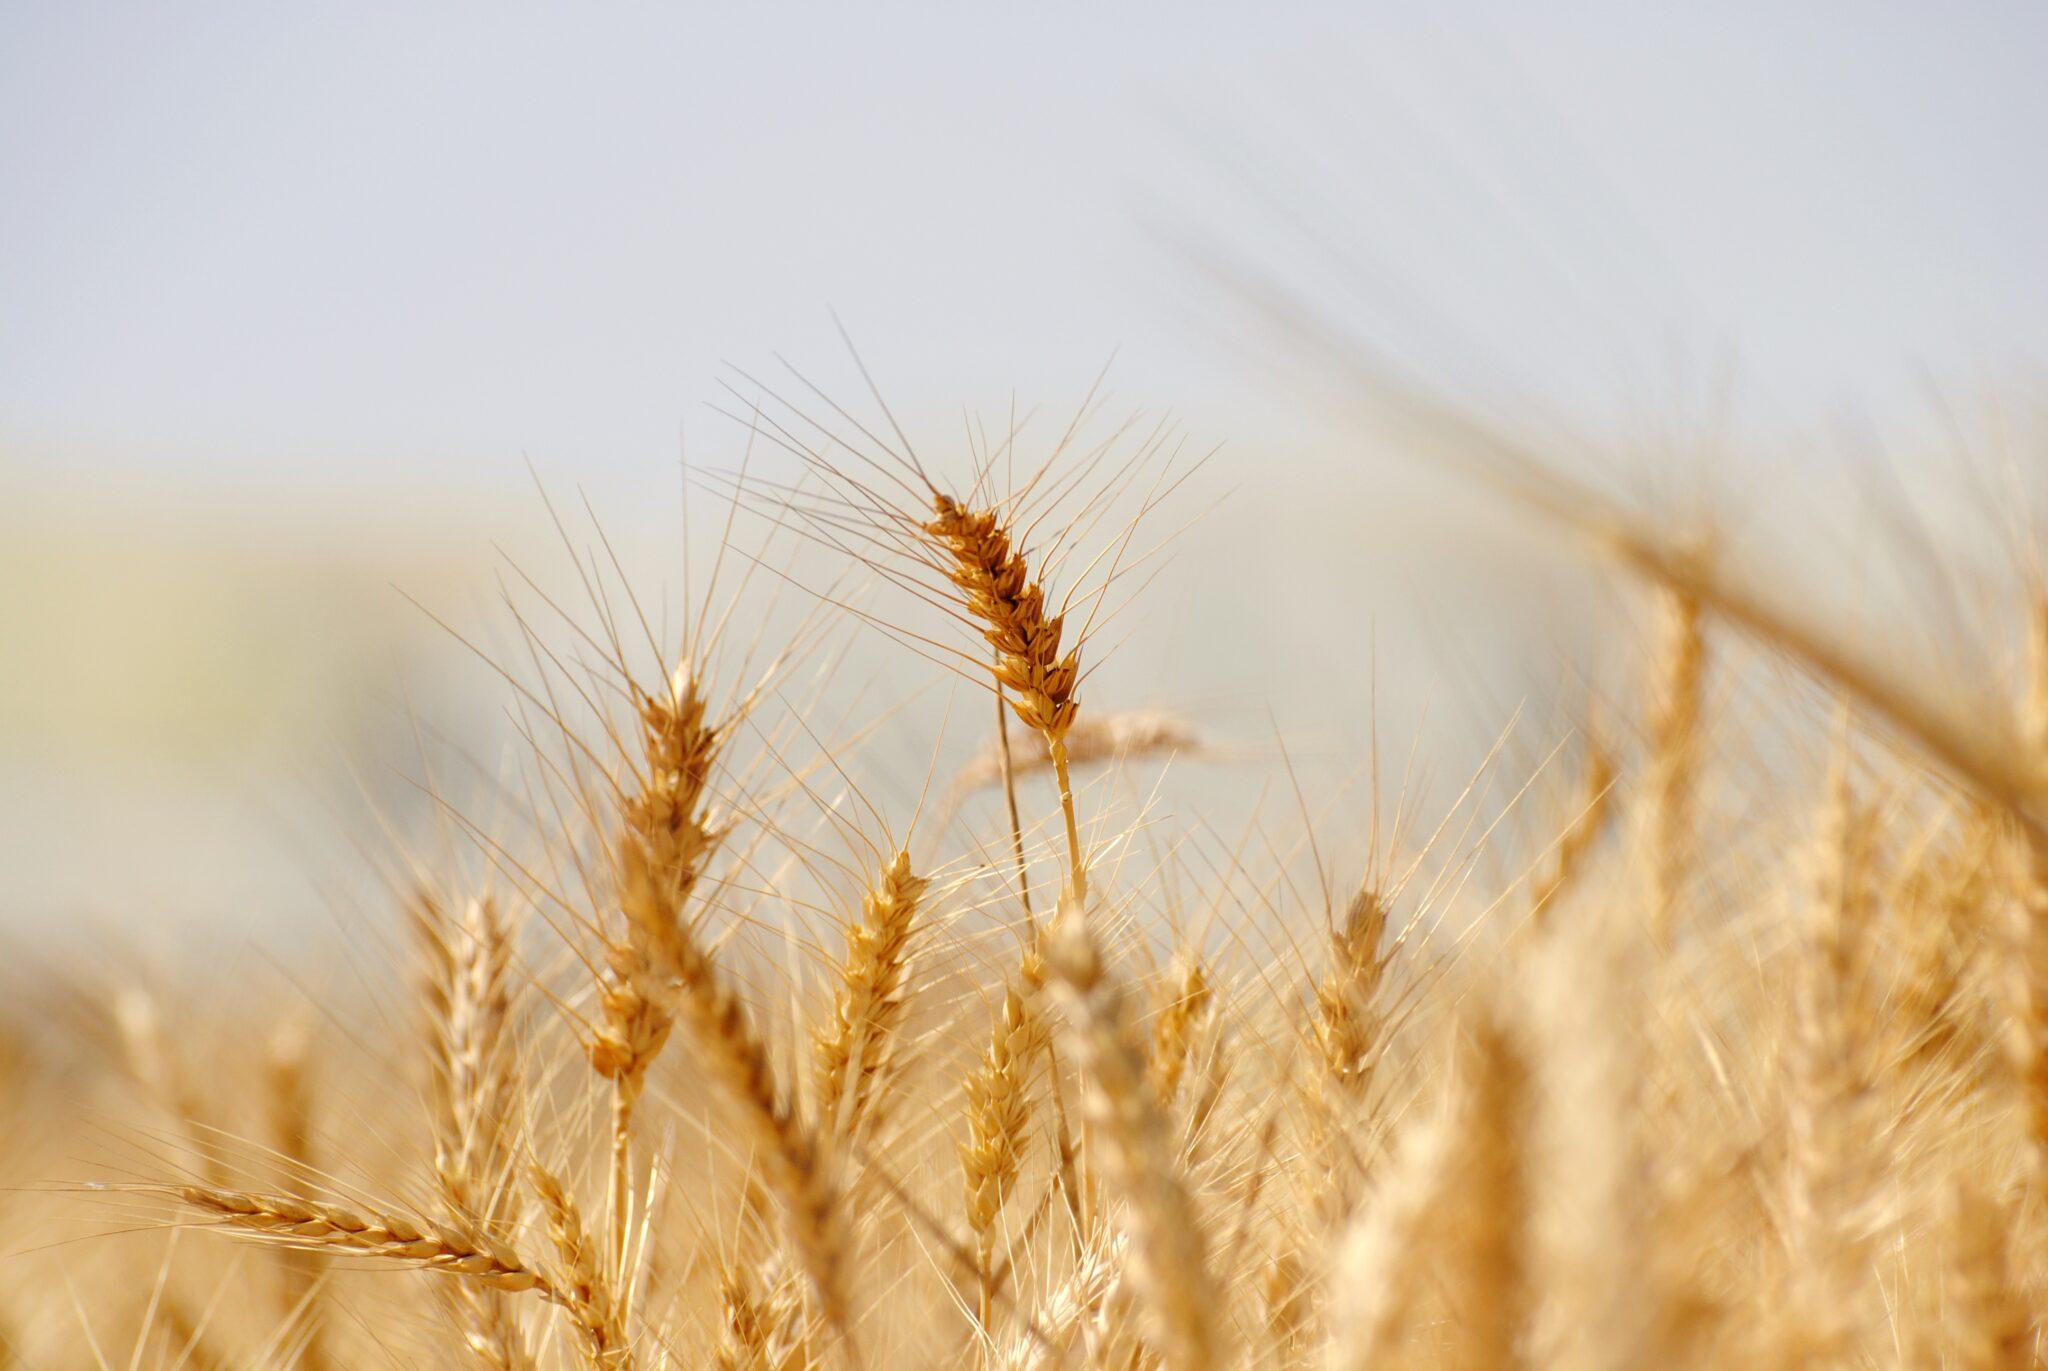 Getreide in Nahaufnahme